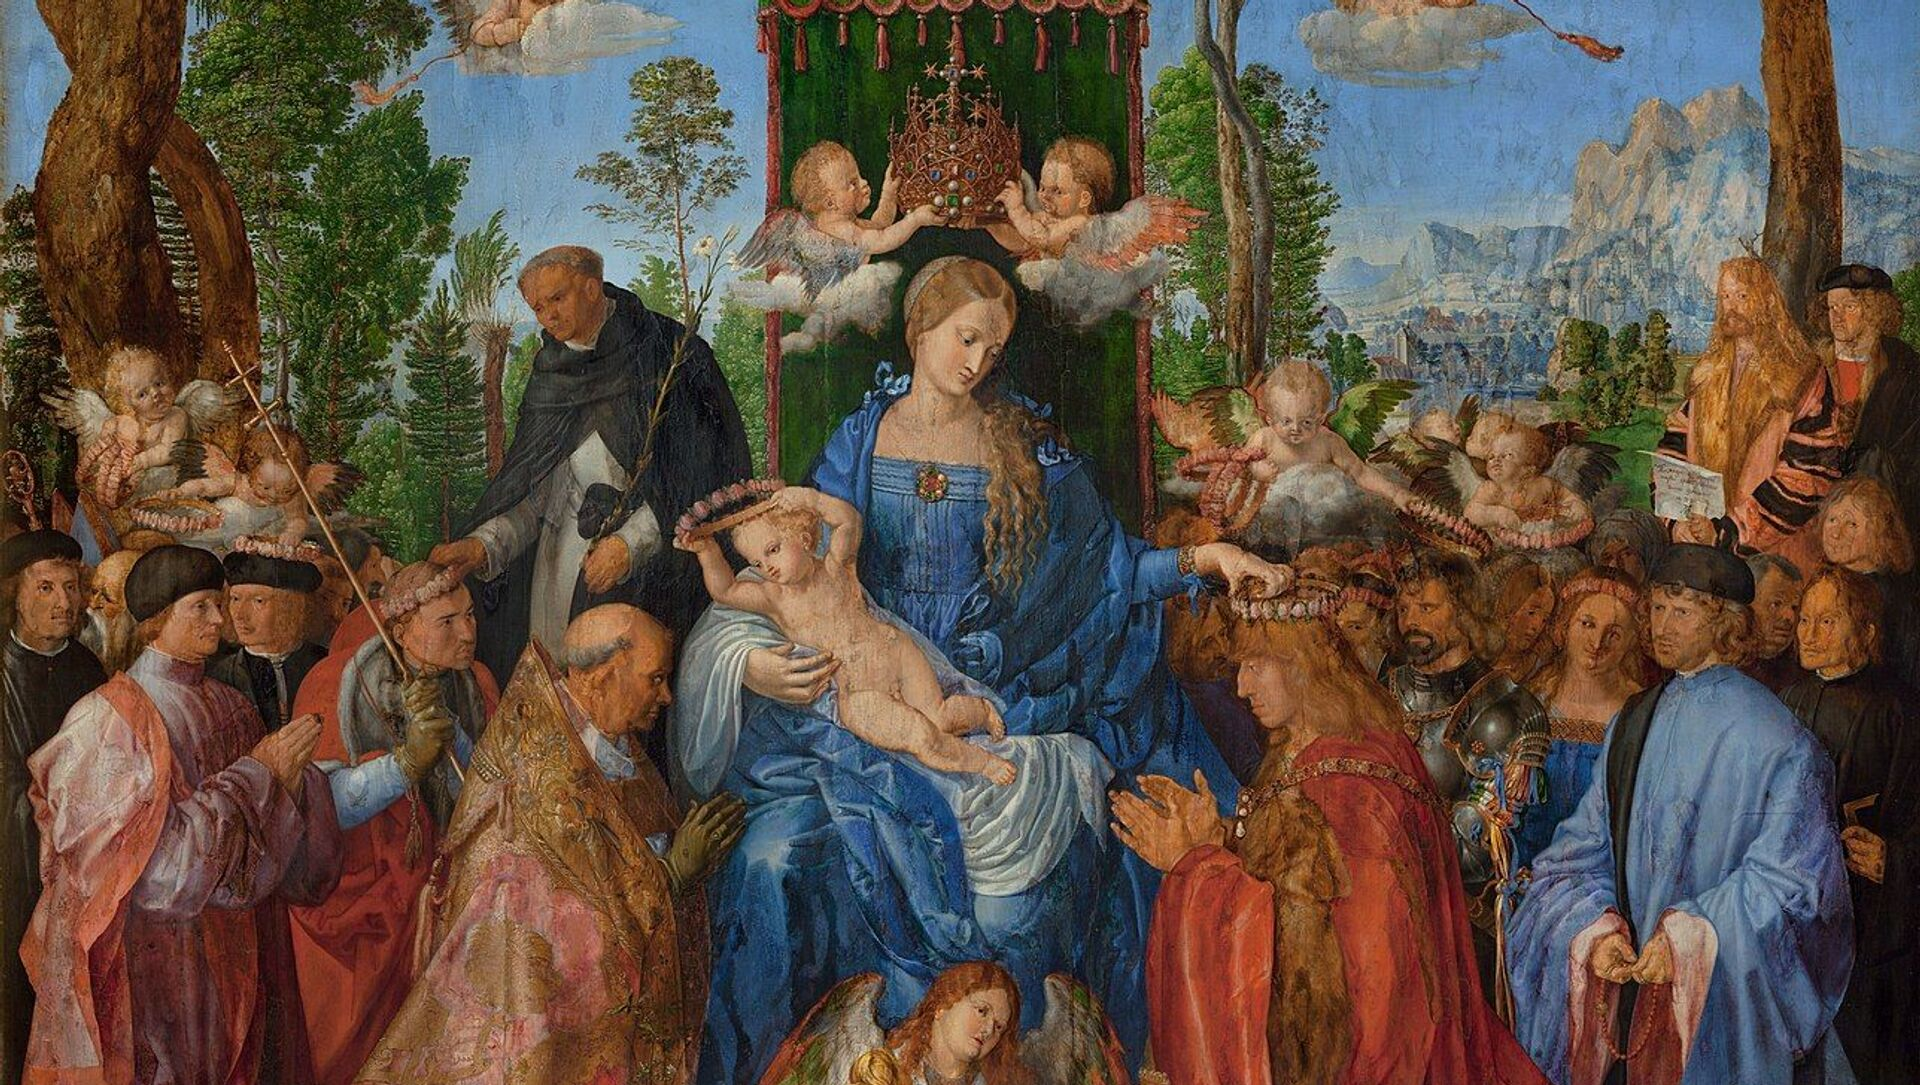 La Festa del Rosario (Rosenkranzfest) di Albrecht Dürer, datato 1506 - Sputnik Italia, 1920, 18.05.2021